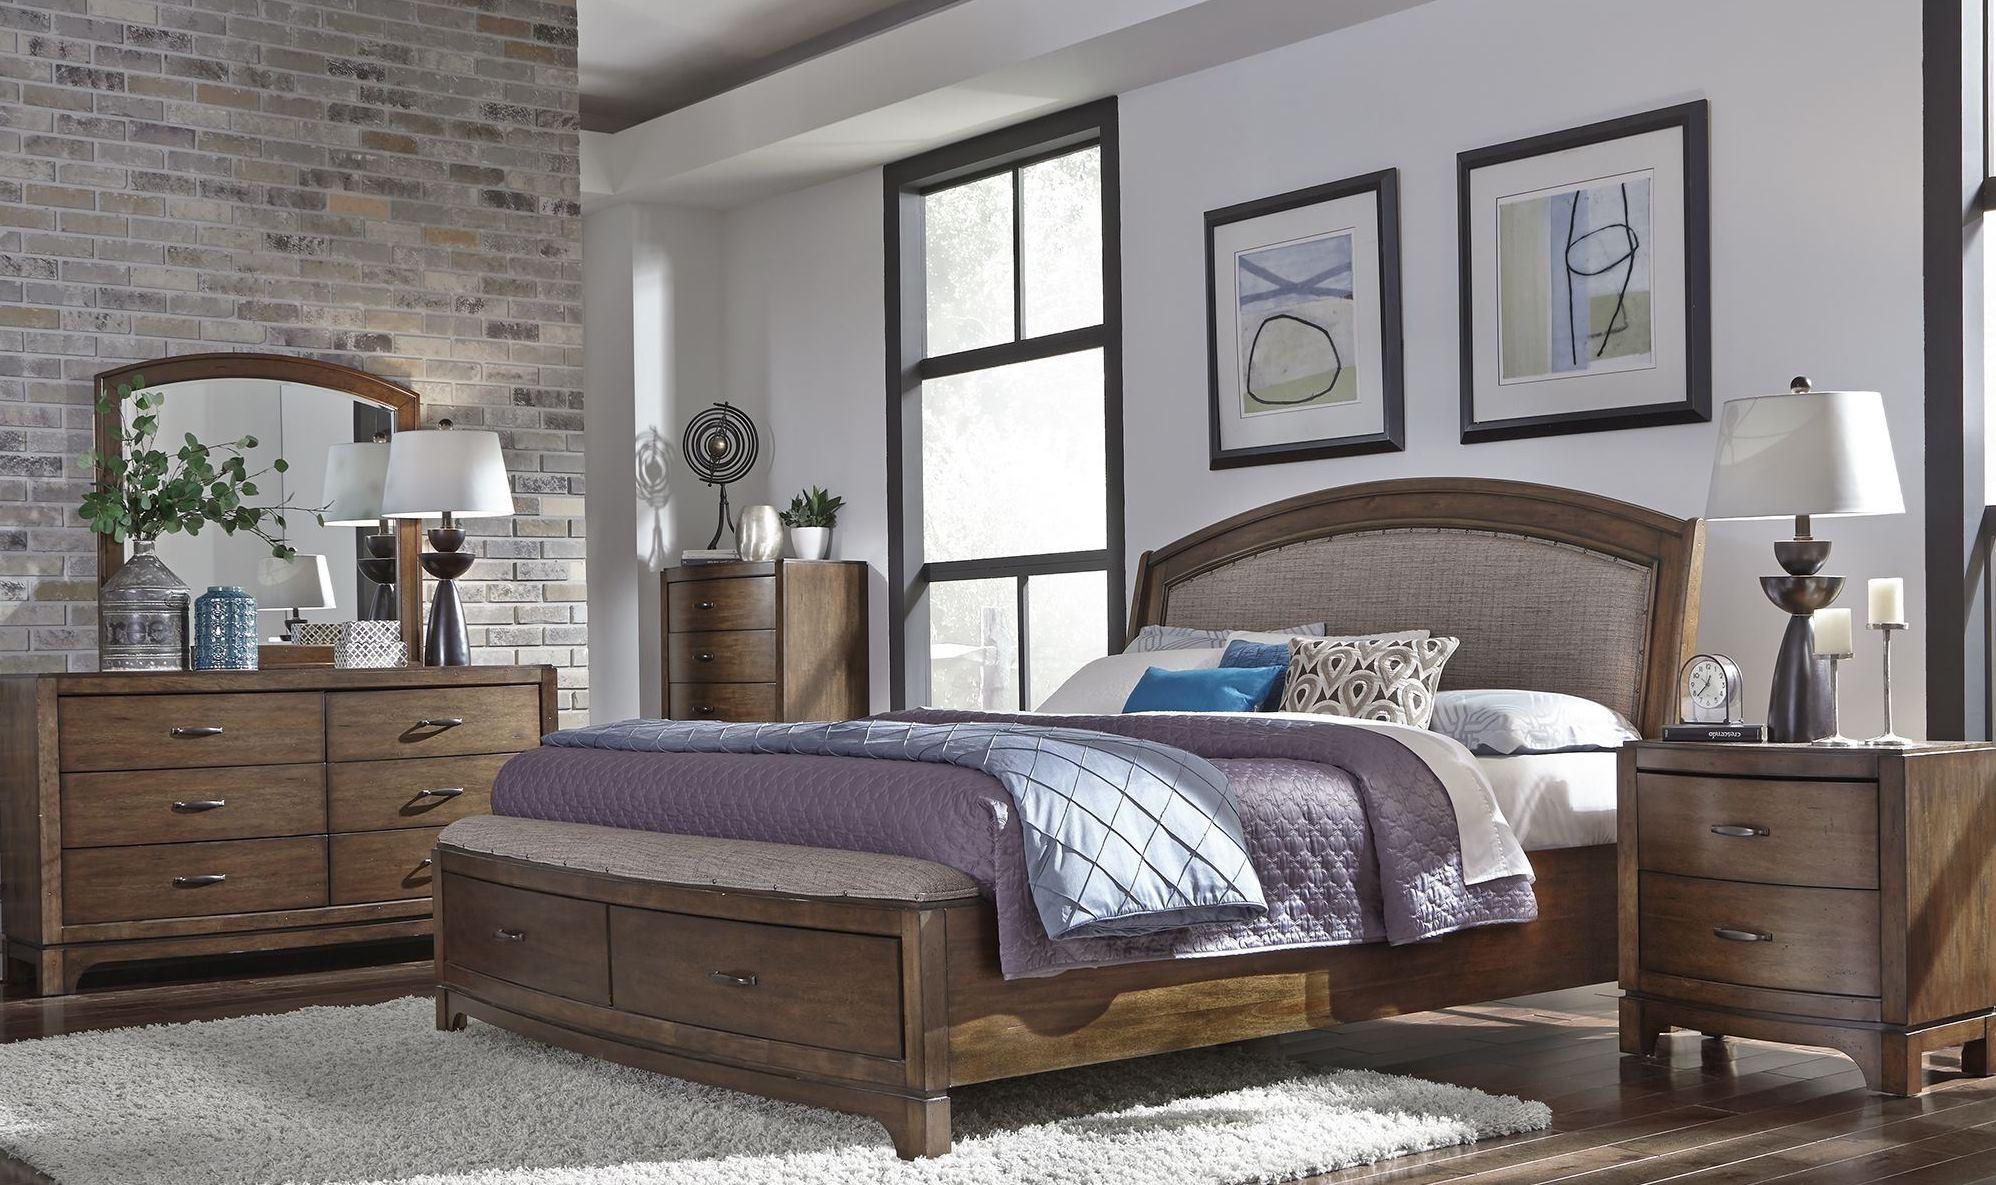 Avalon Iii Pebble Brown Upholstered Storage Bedroom Set